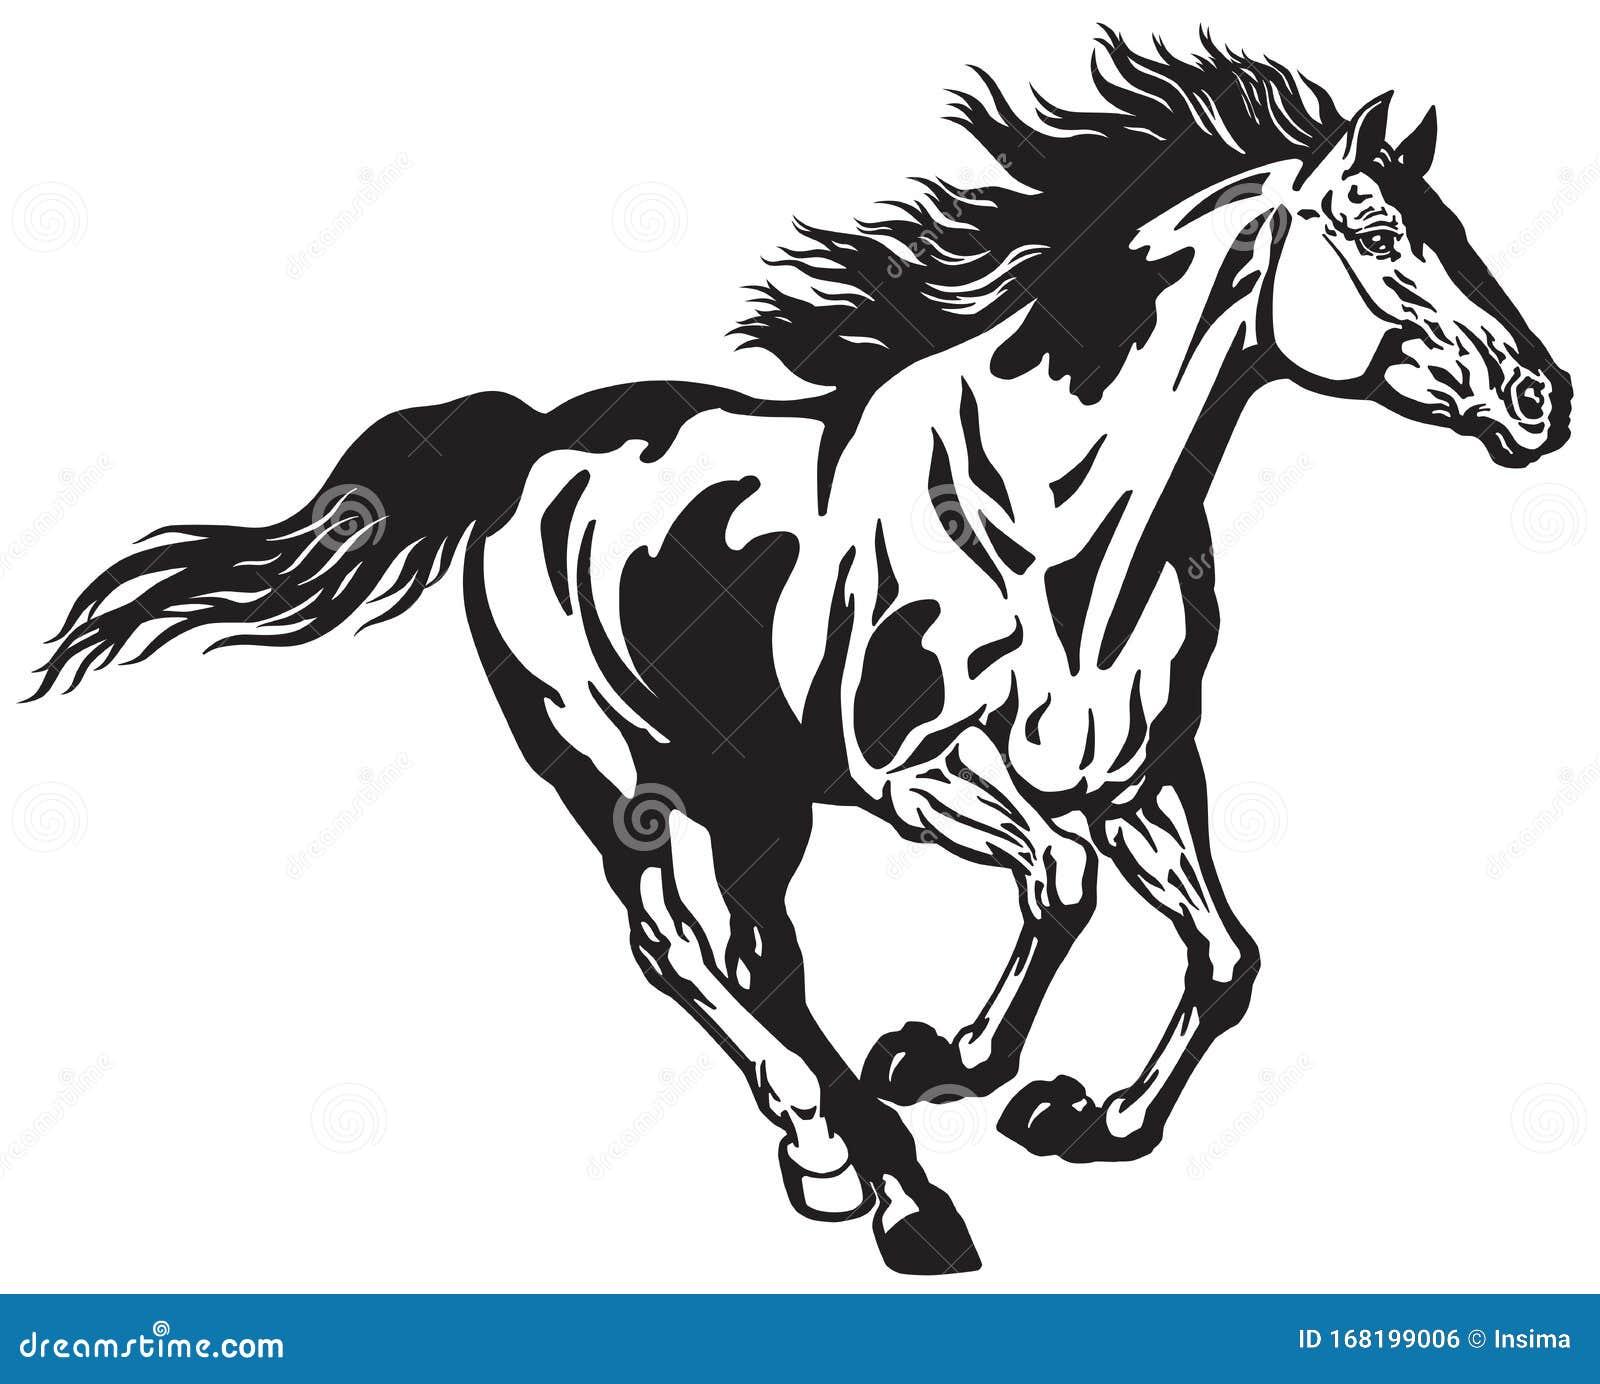 Wild Horse Running Free Black And White Stock Vector Illustration Of Stallion Stable 168199006